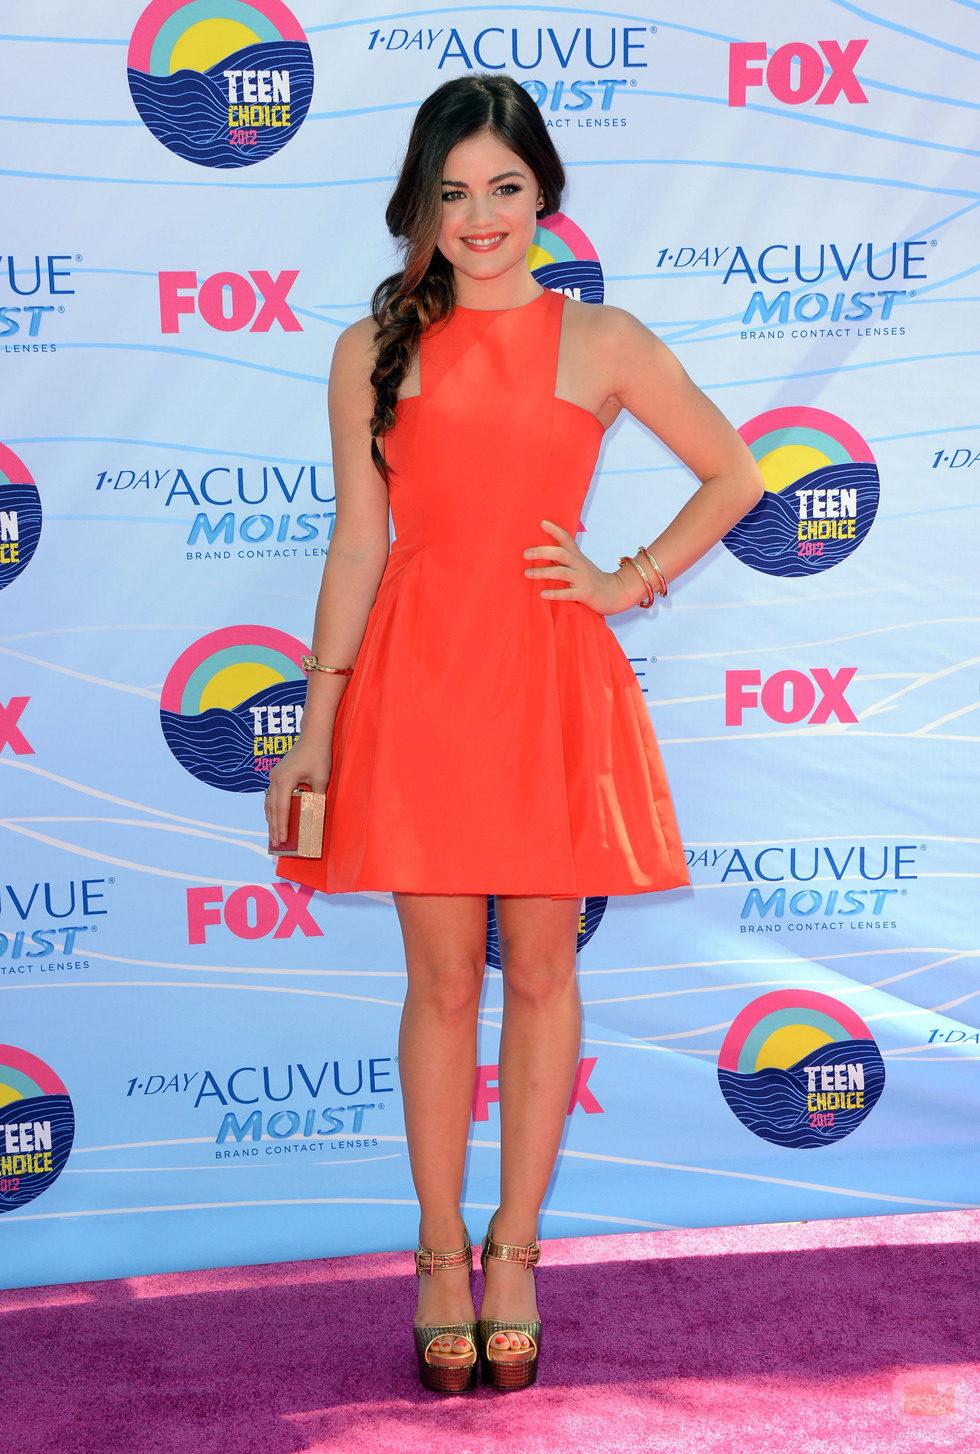 Lucy Hale en los Teen Choice Awards 2012